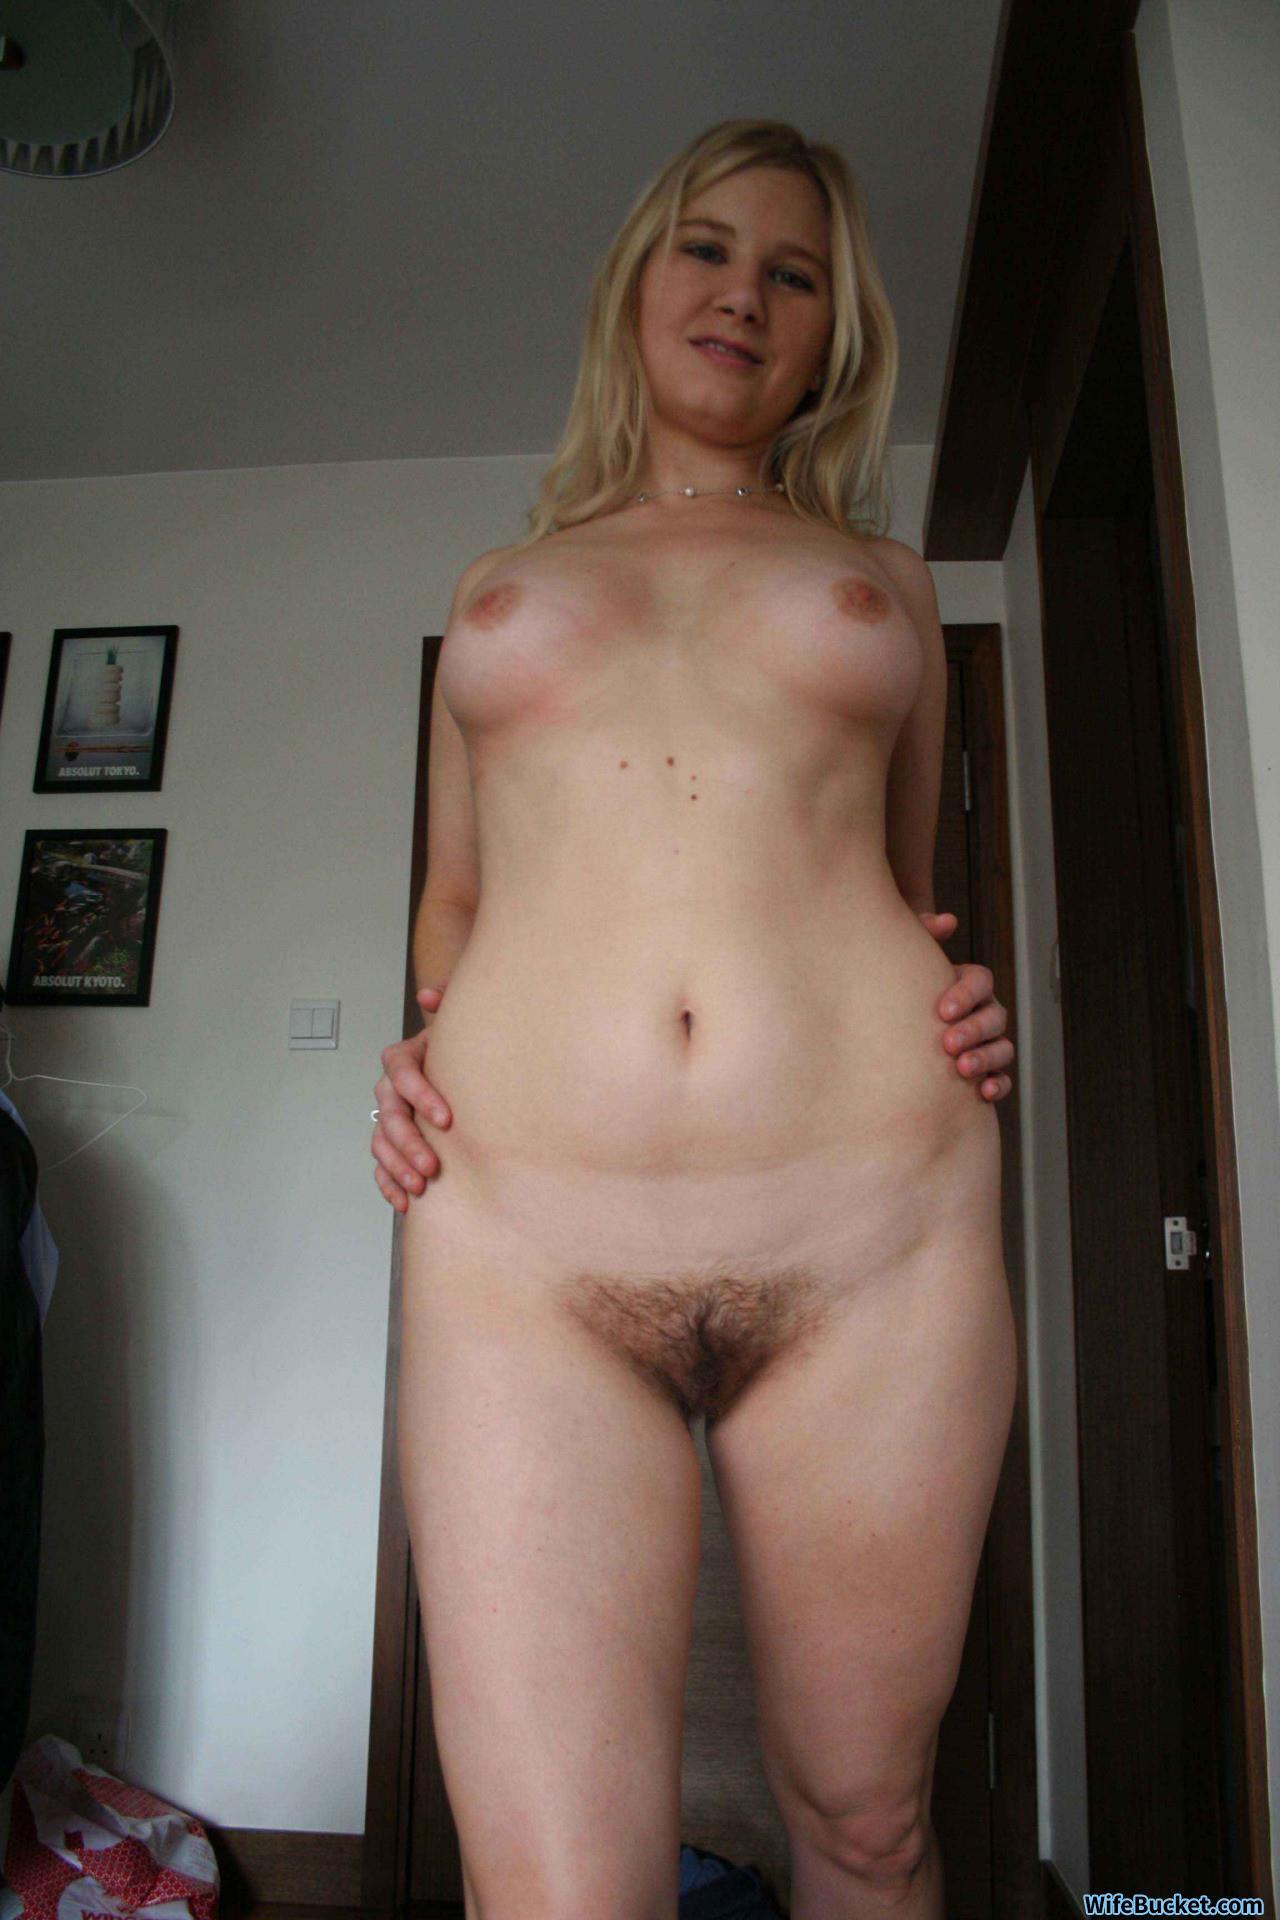 Naked housewife selfies